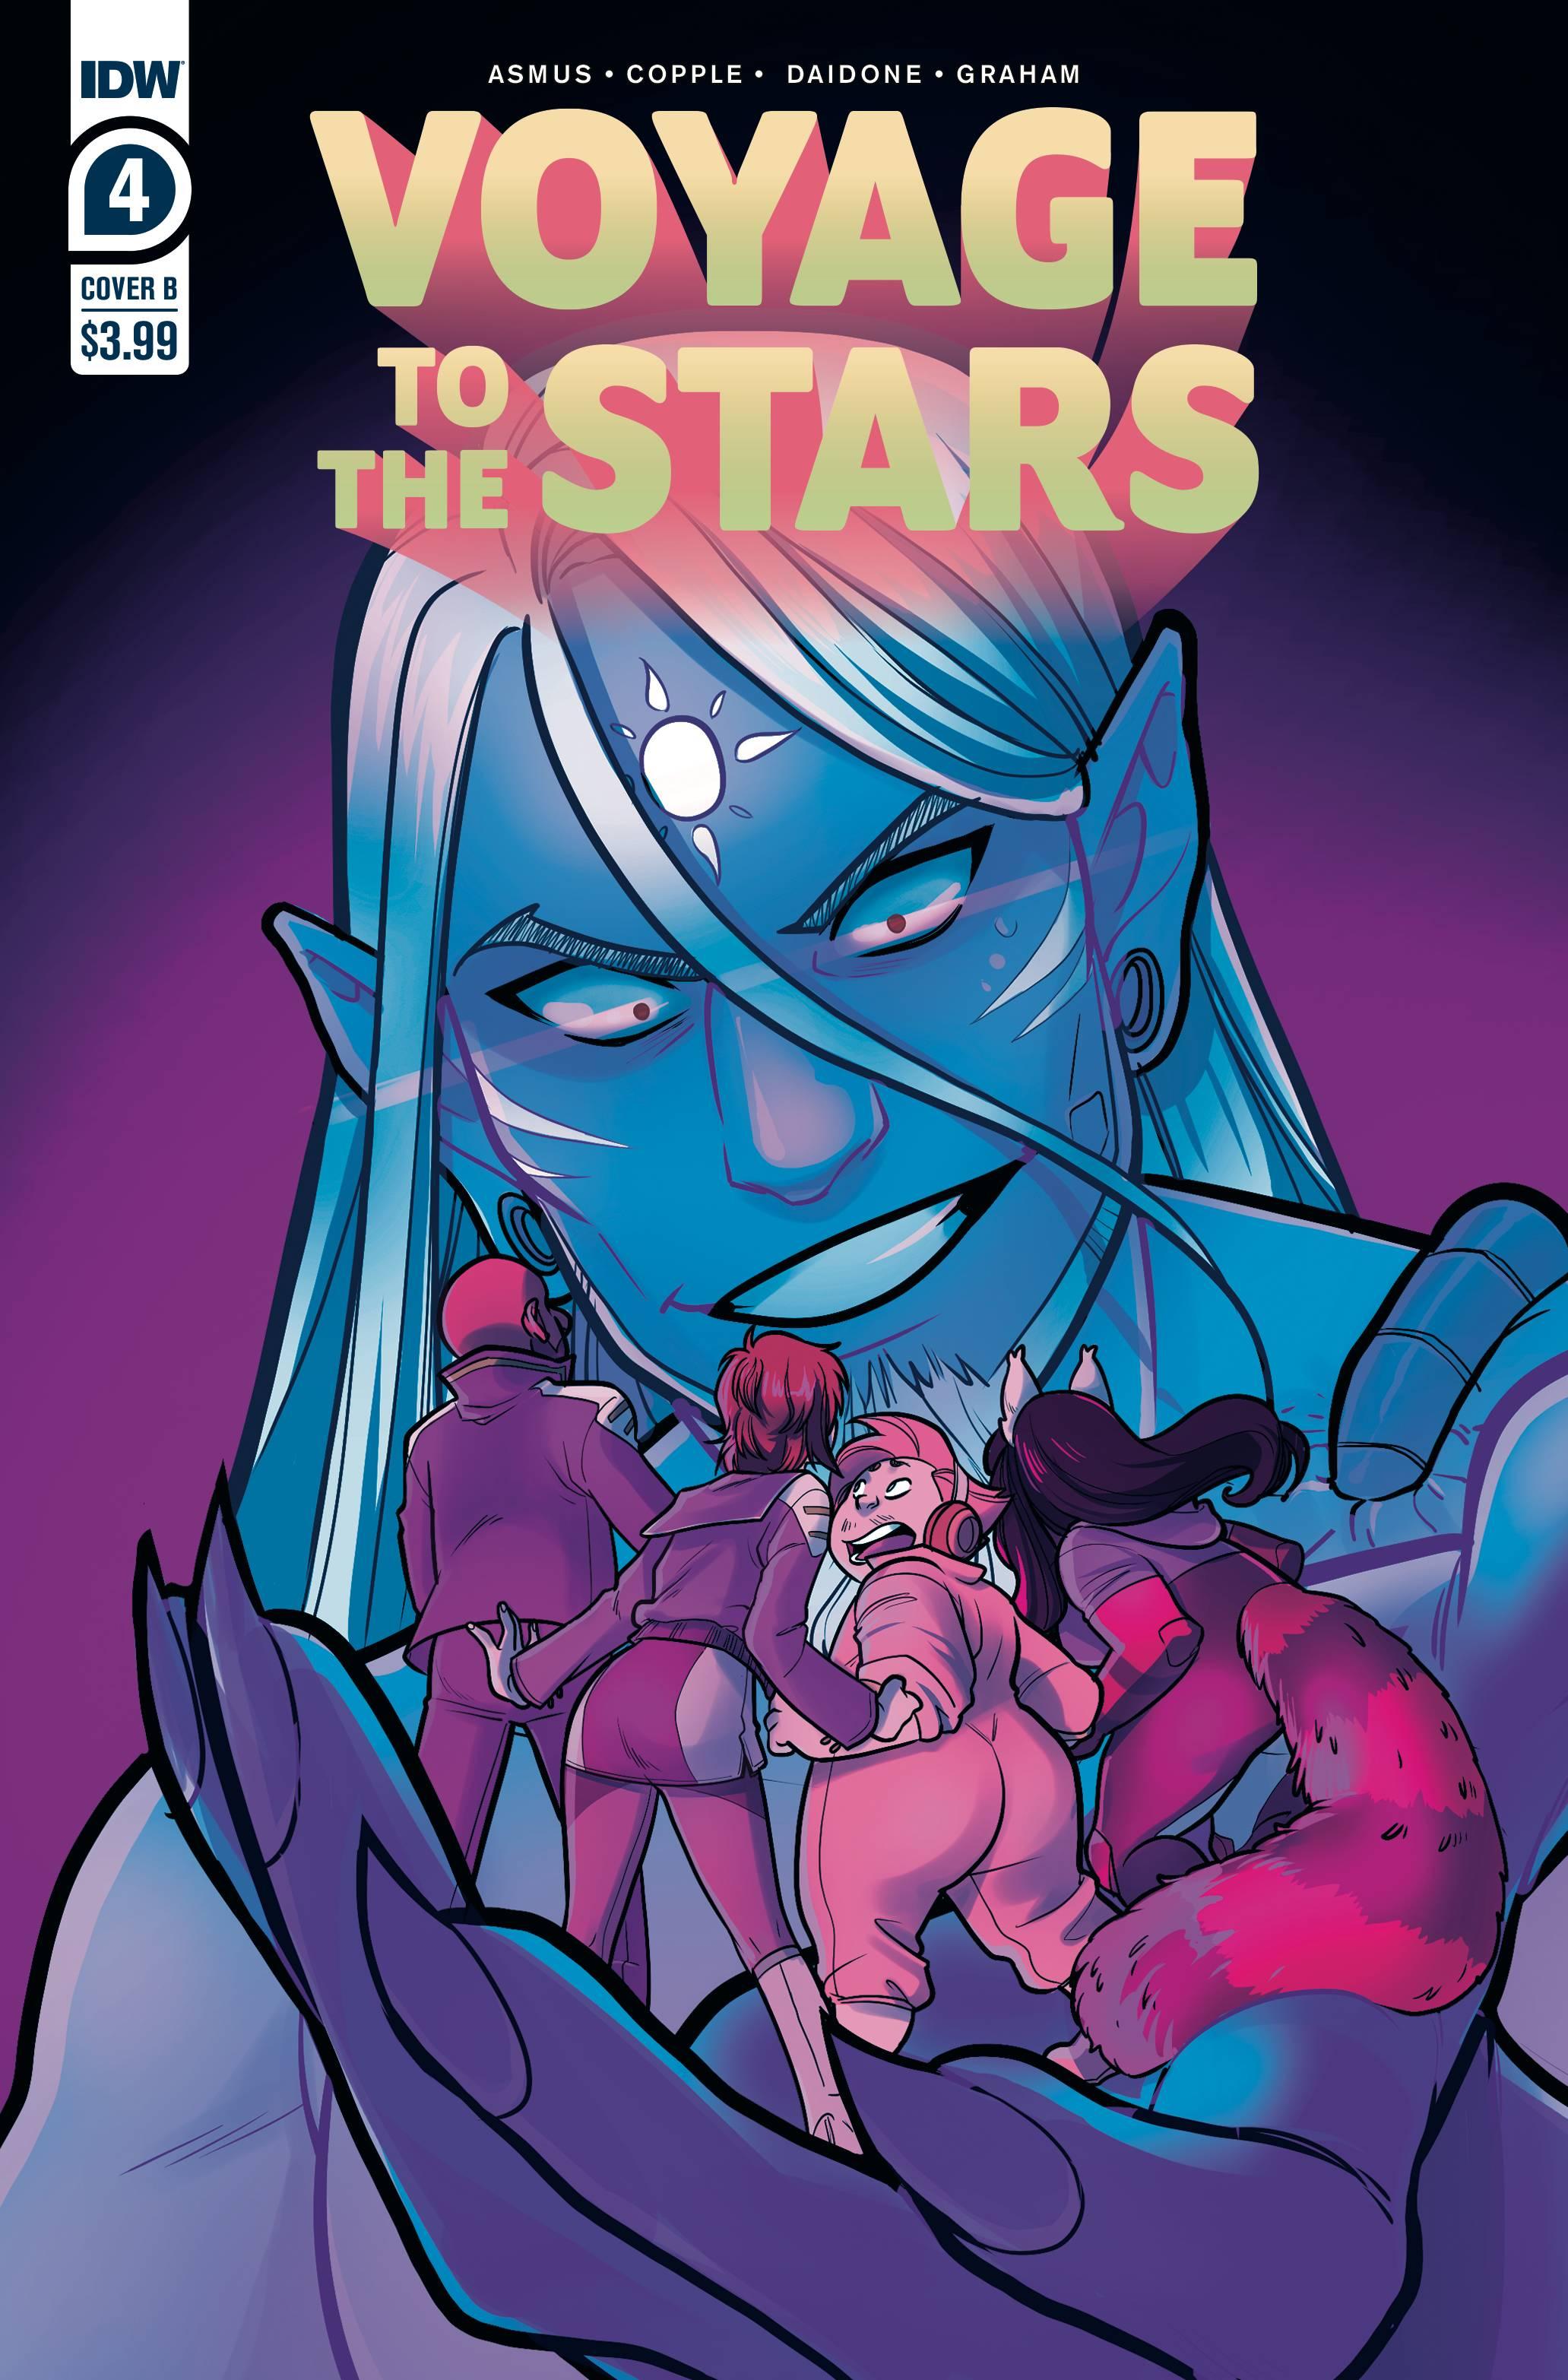 VOYAGE TO THE STARS #4 (OF 4) CVR B DAIDONE